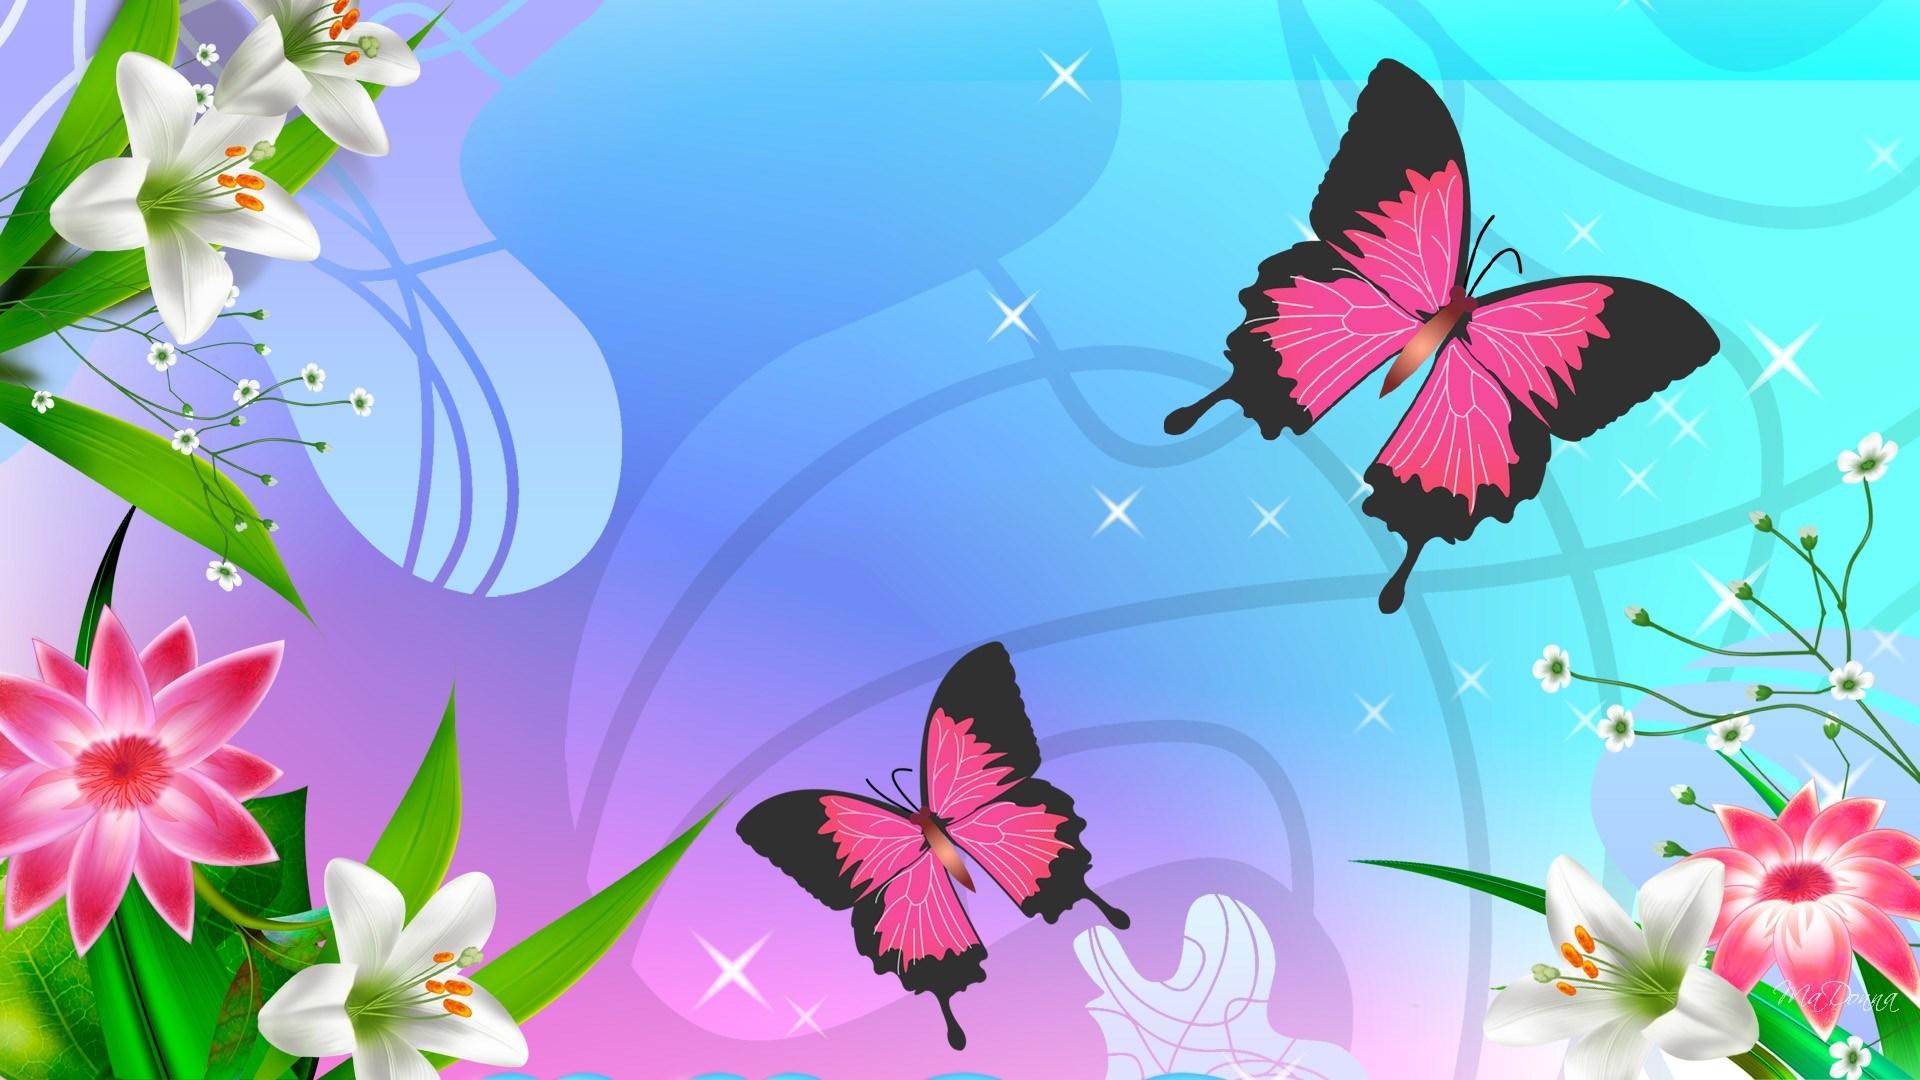 desktop-butterfly-border-wallpaper-wpc9004175